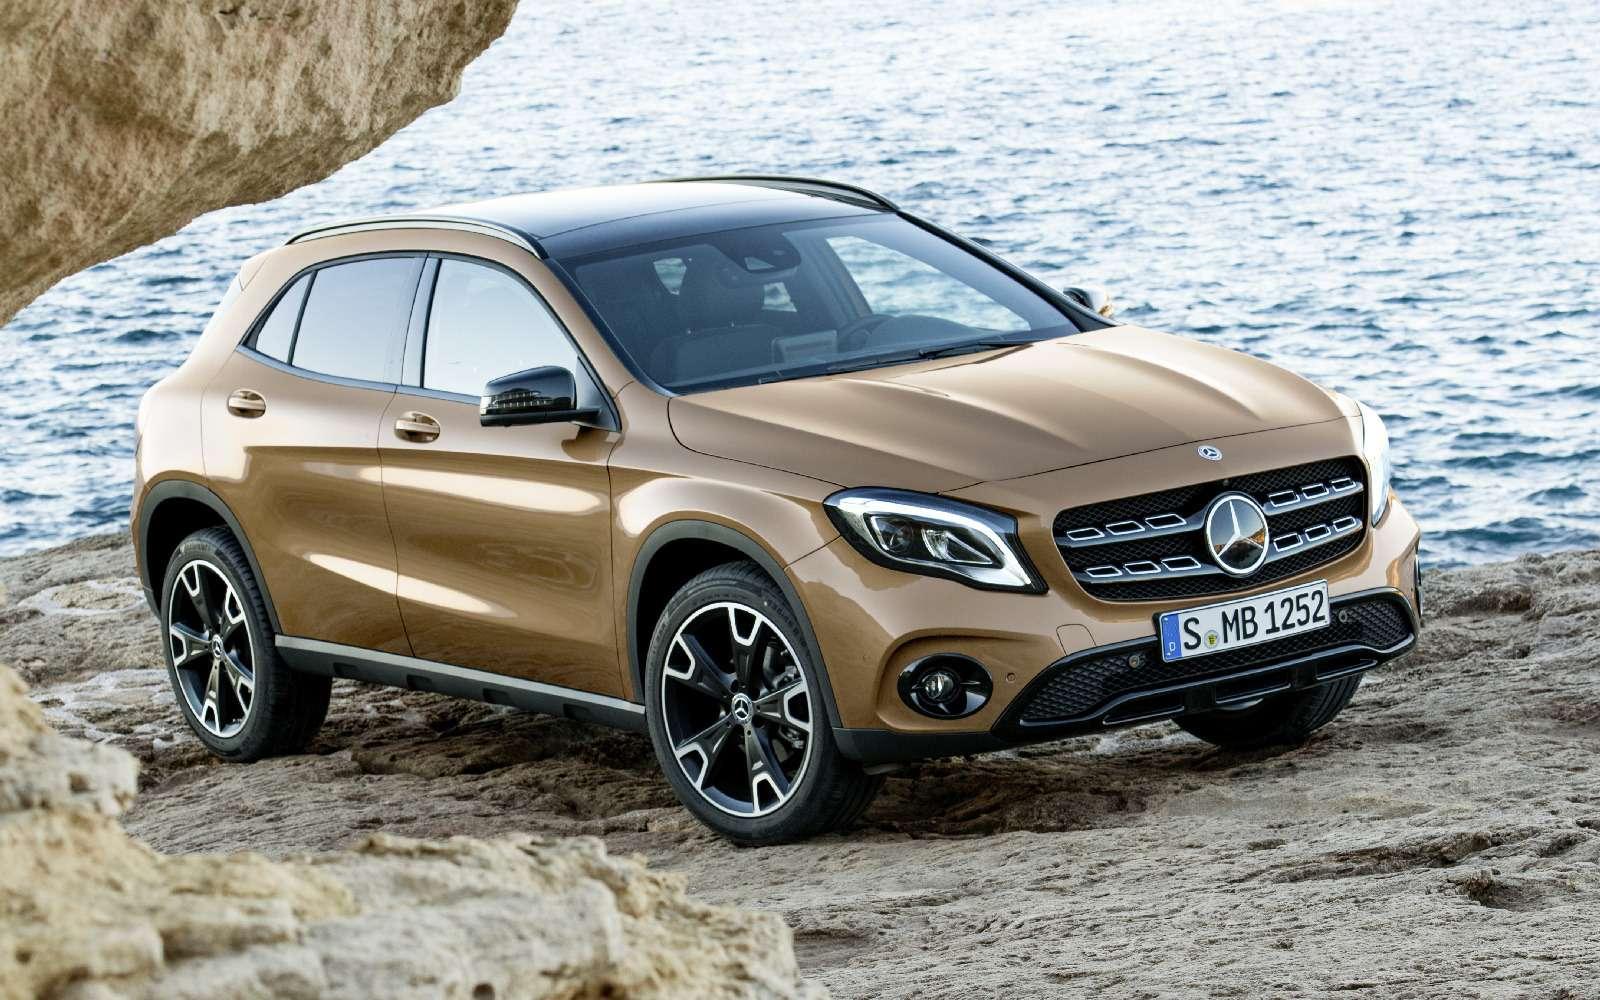 Mercedes-Benz GLA стал краше, нонепросторнее— фото 690073